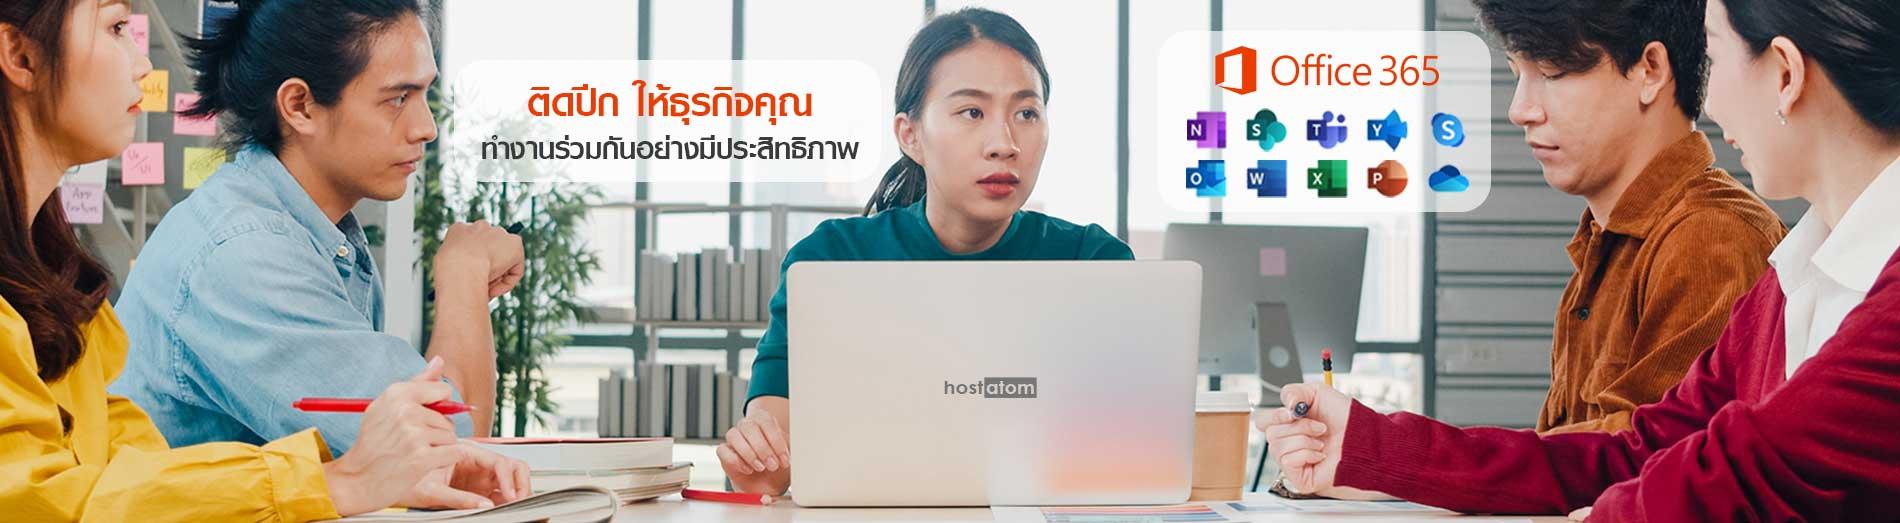 microsoft-office-365-2-1